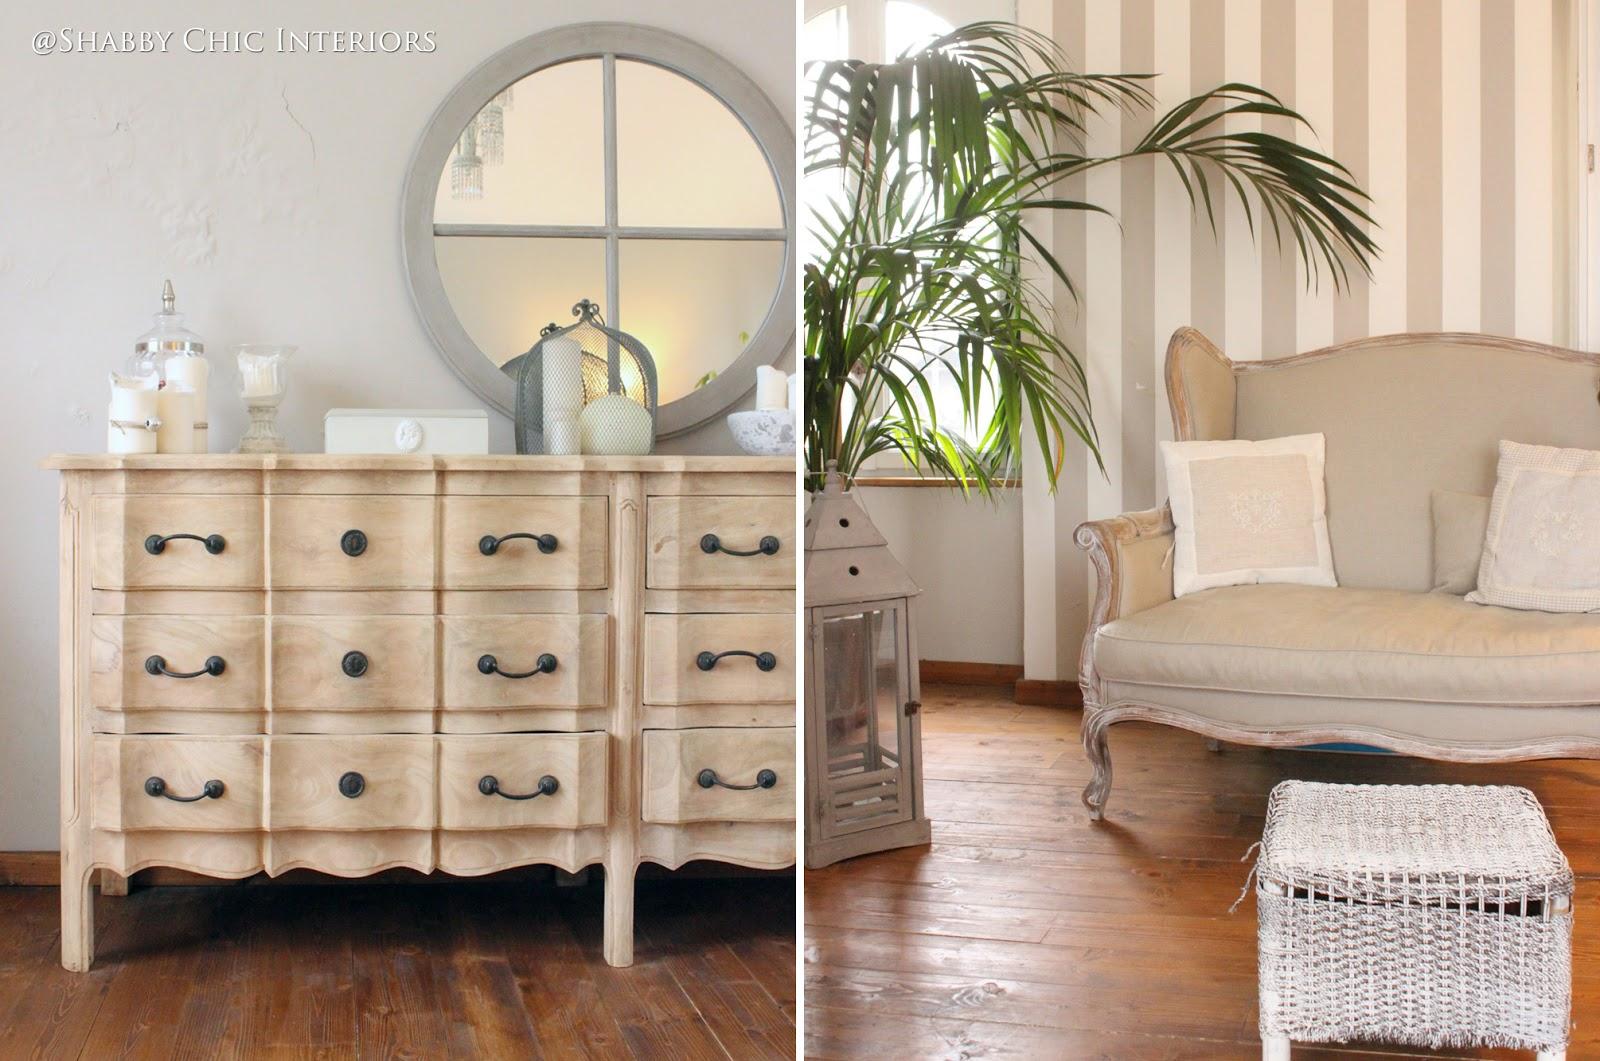 Shabby chic interiors novembre 2014 for Case arredate shabby chic